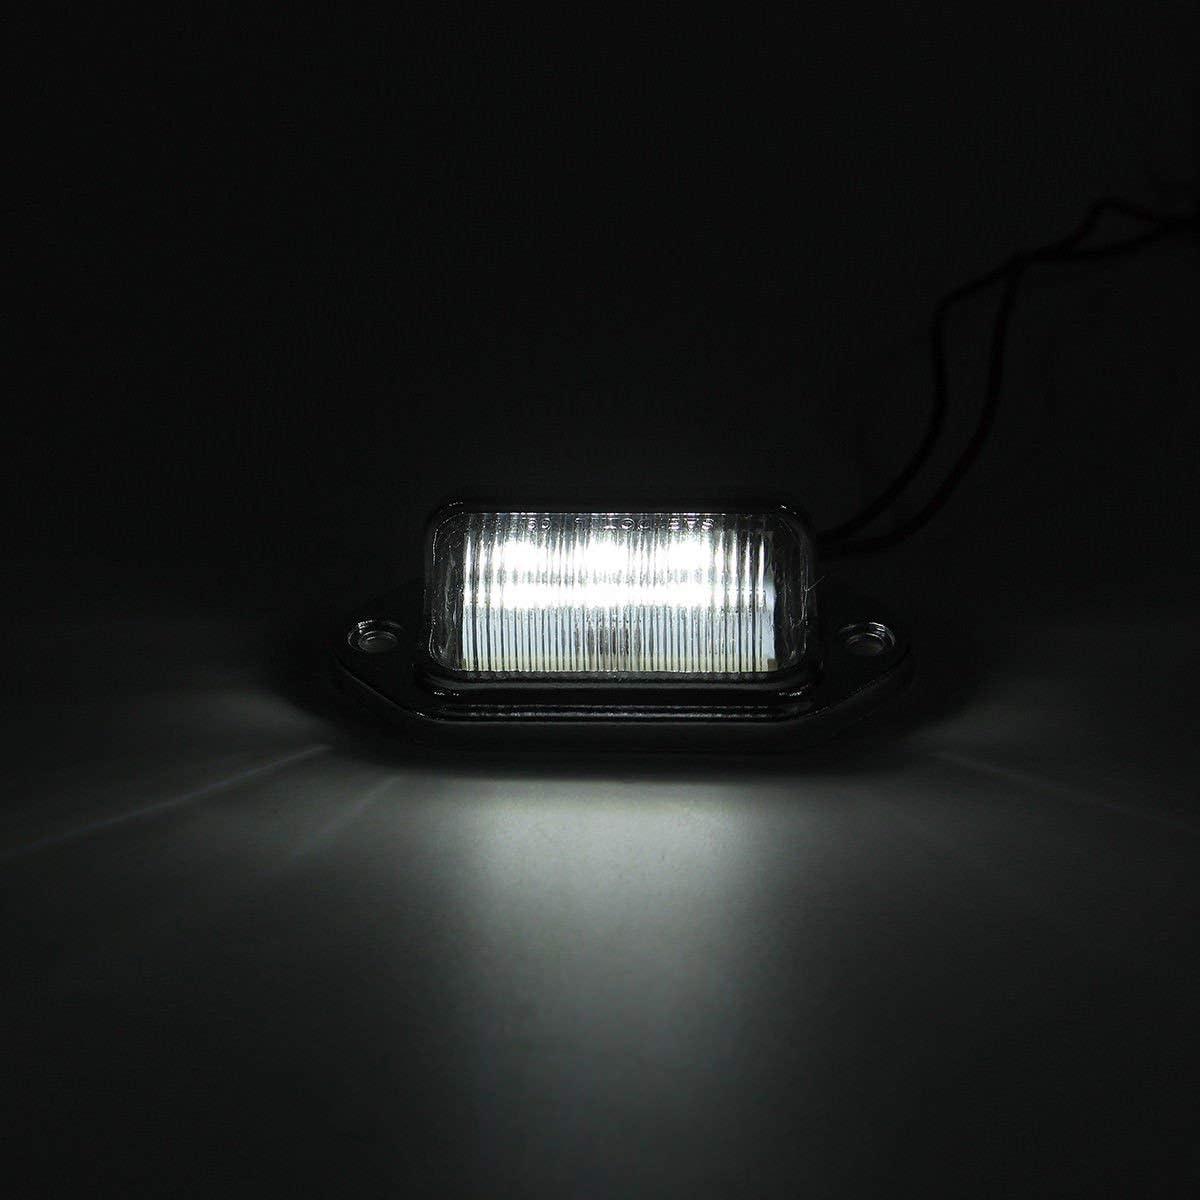 Beauneo 2Pcs 6-Leds Number License Plate Tag Light 12V For Trailers Trucks Lorries Caravans Boat Rv Interior Step Lamp